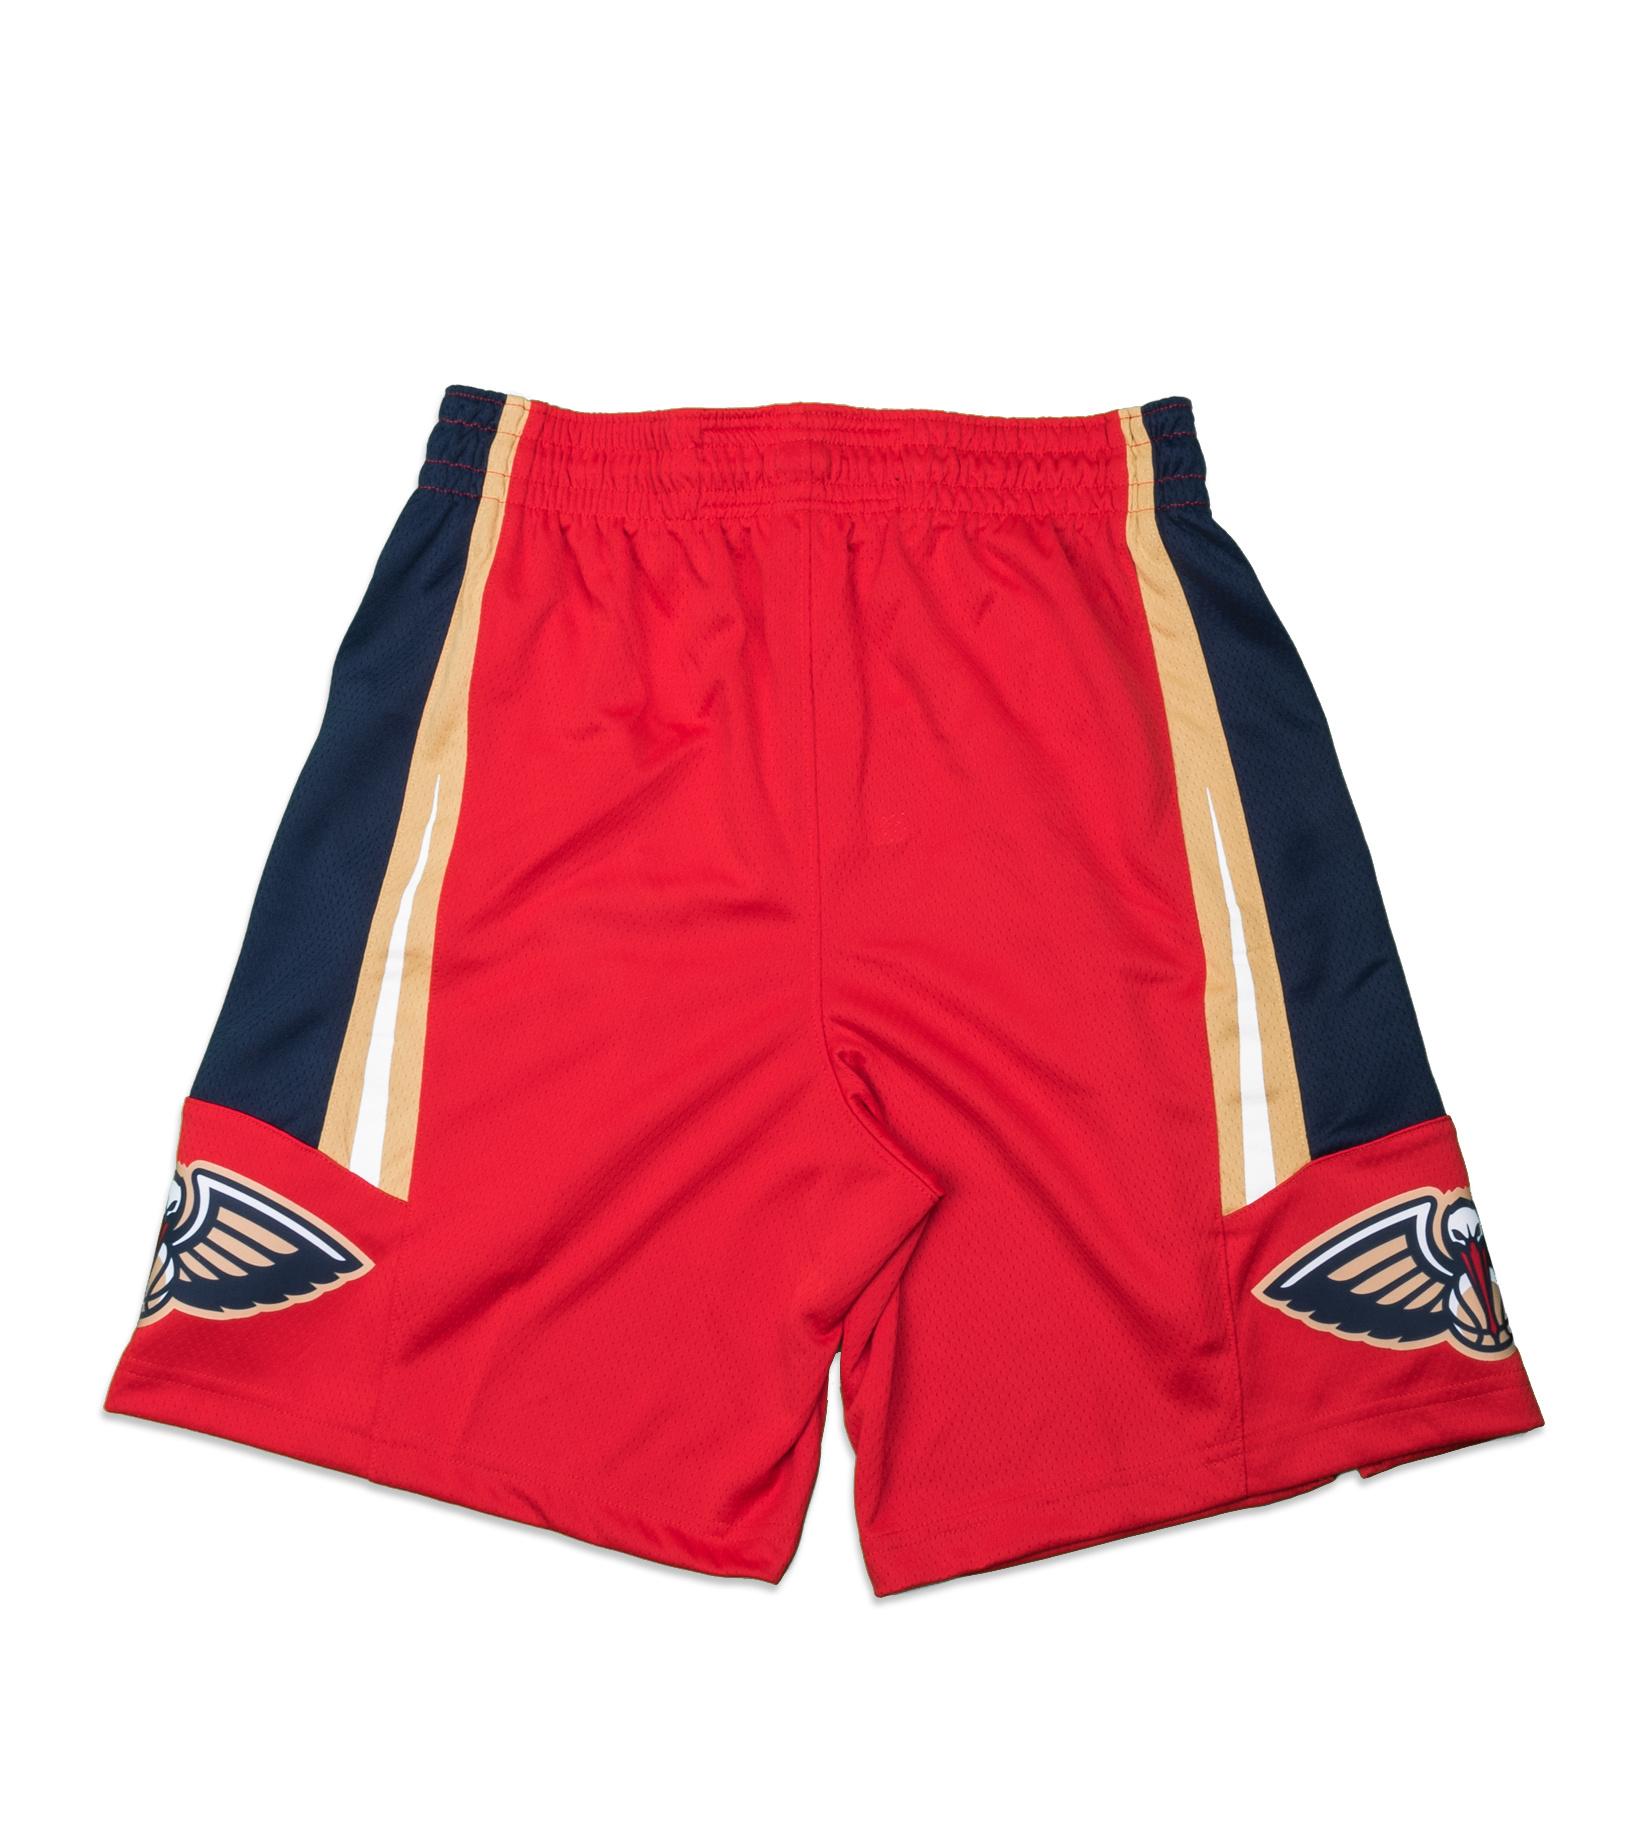 "New Orleans Pelicans Statement Edition '20 Swingman Short ""University Red/College Navy""-7"